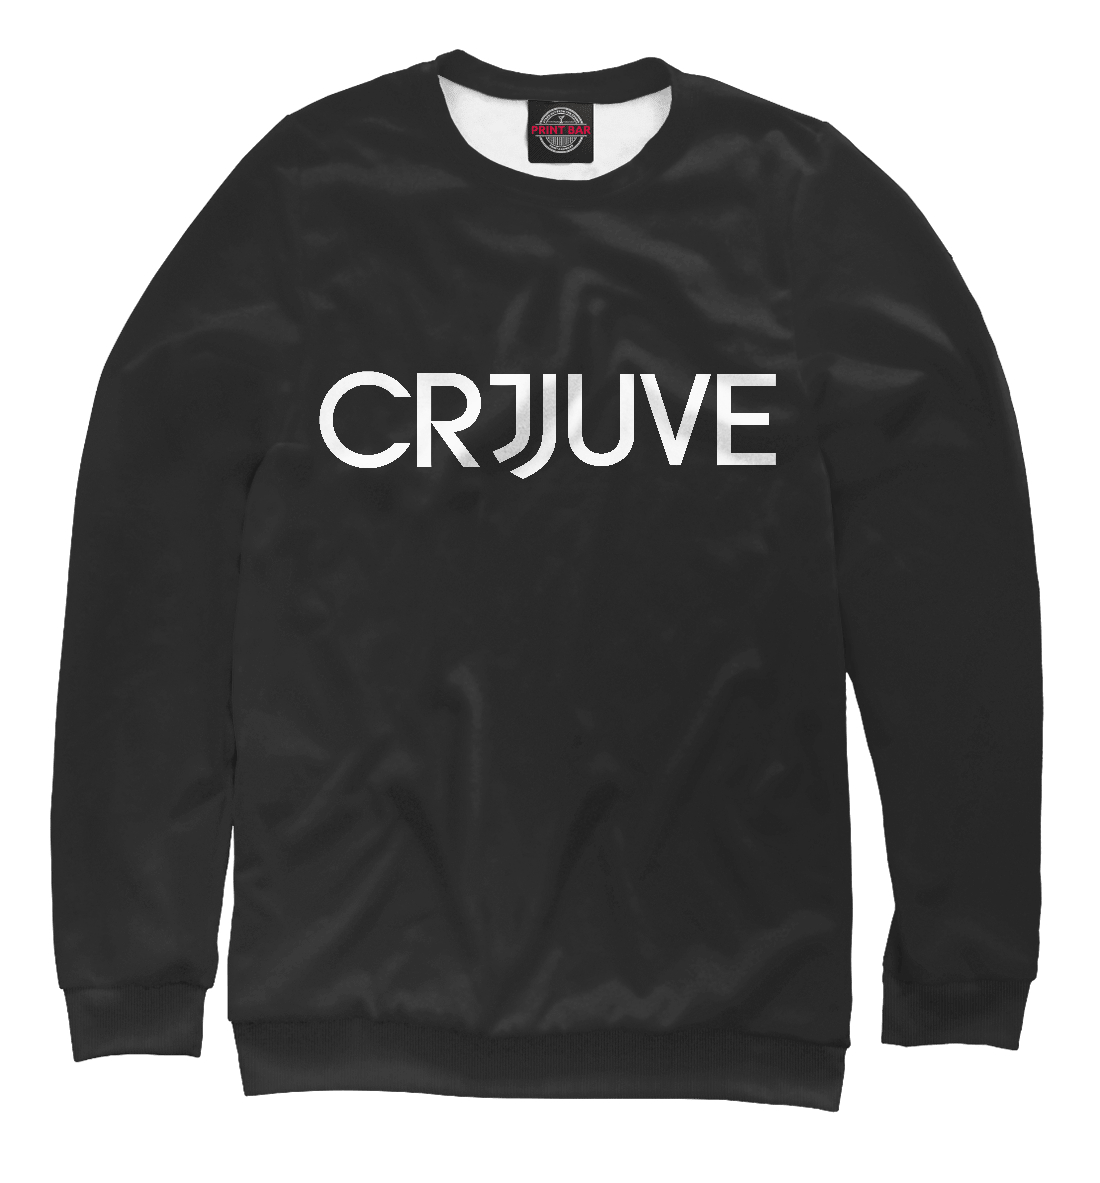 Купить Juventus - Ronaldo, Printbar, Свитшоты, JUV-857748-swi-1